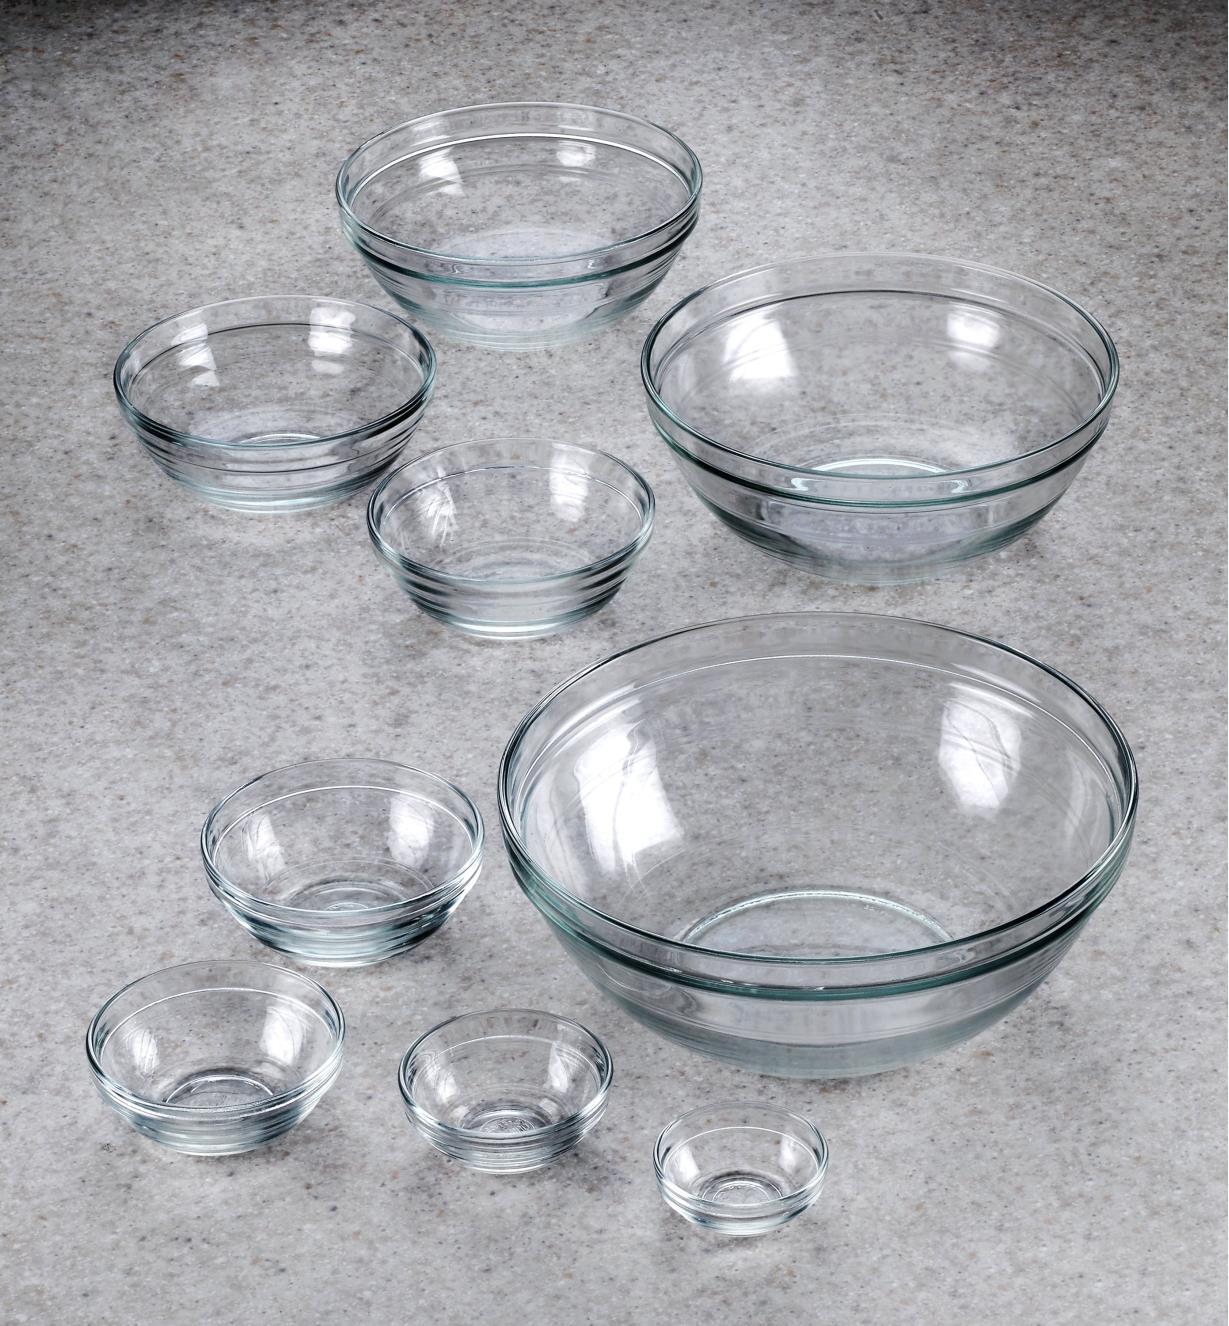 A set of nine Duralex glass bowls arranged on a countertop